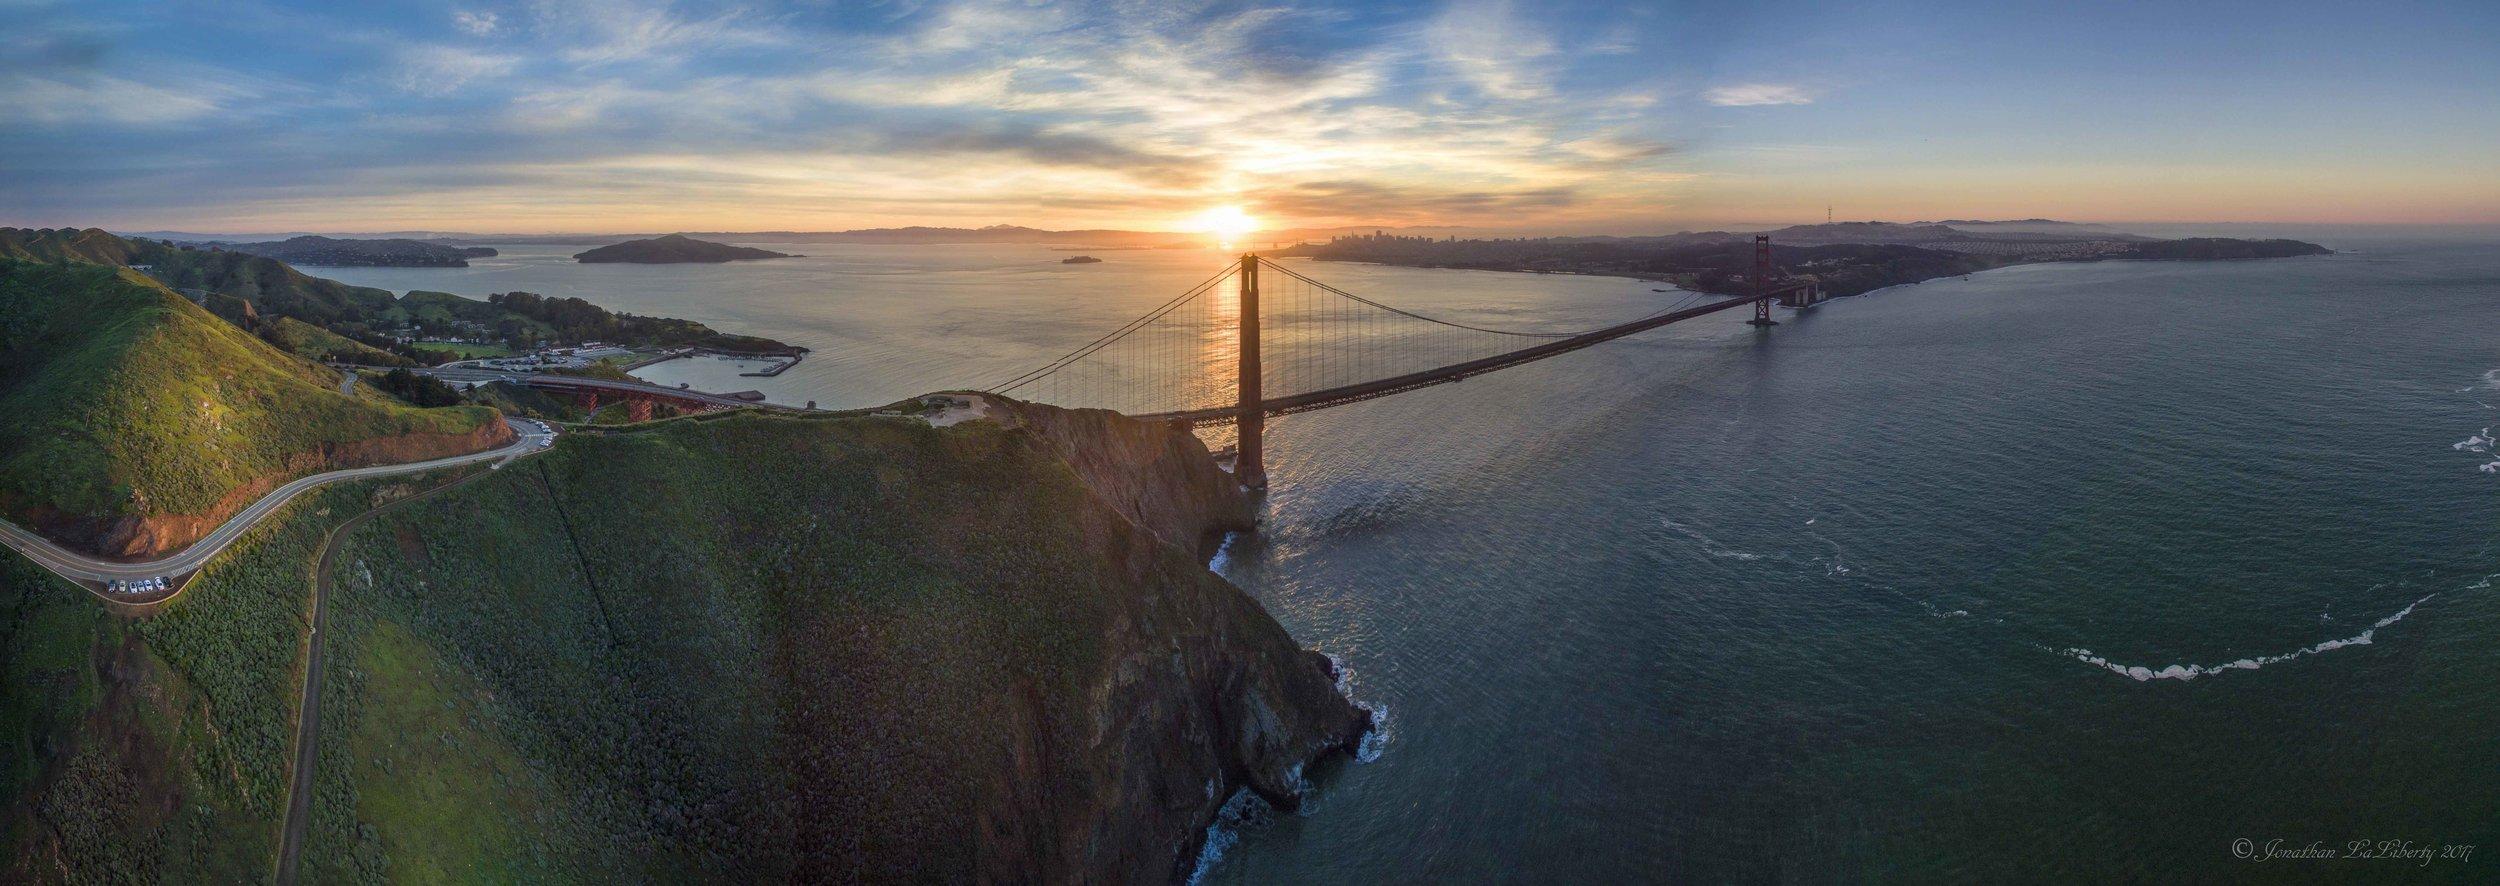 Golden Gate Bridge Aerial Drone Photography Print